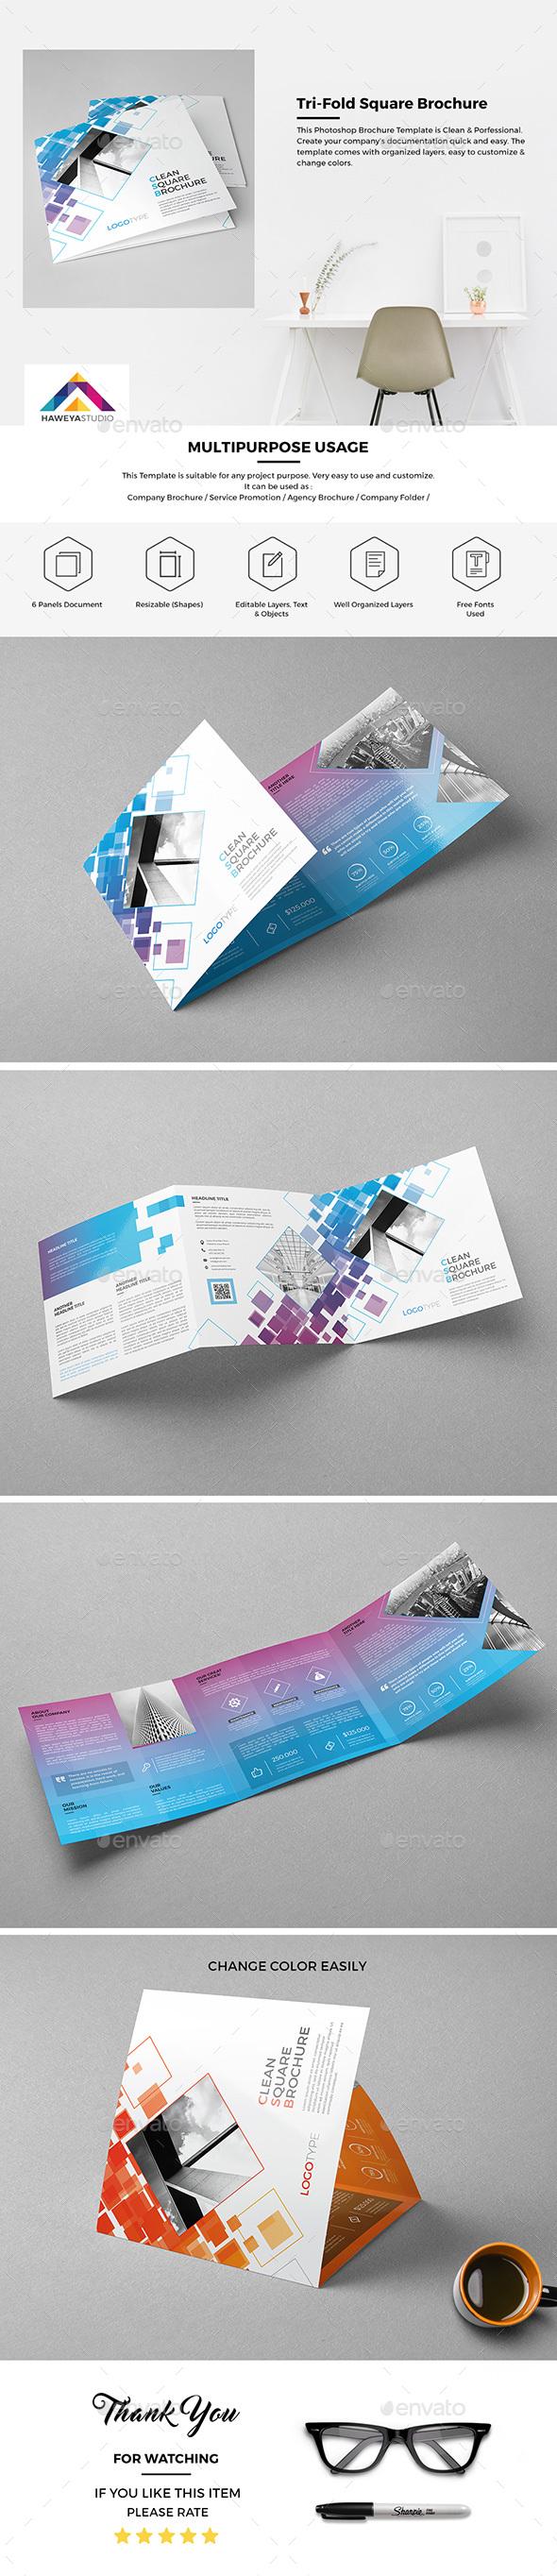 Haweya Tri-Fold Square Brochure 02 - Corporate Brochures